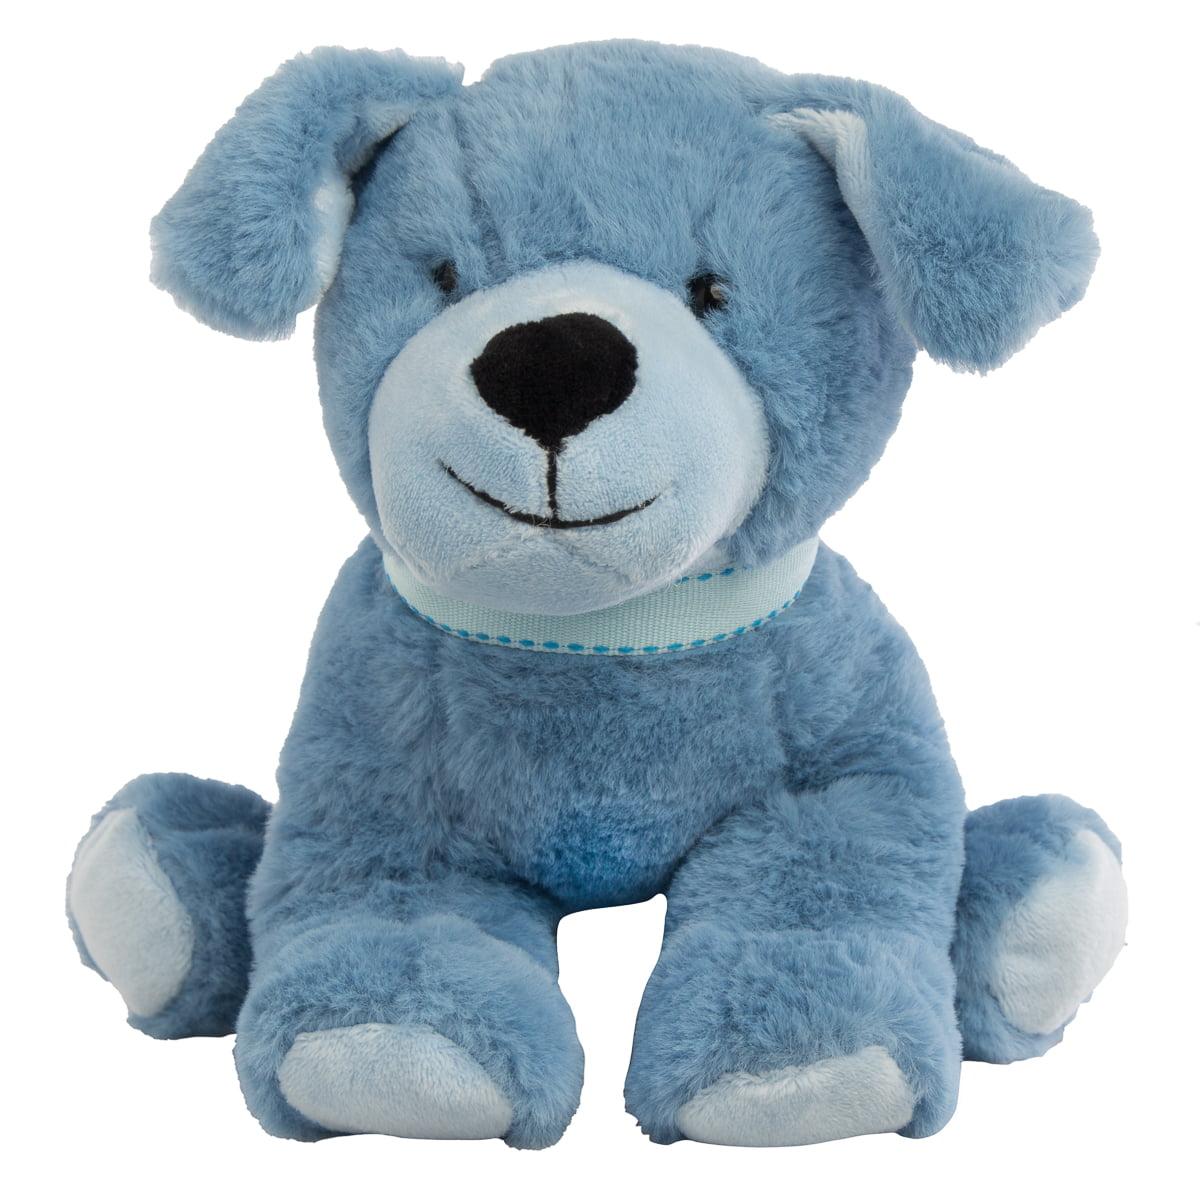 Image result for blue stuffed dog